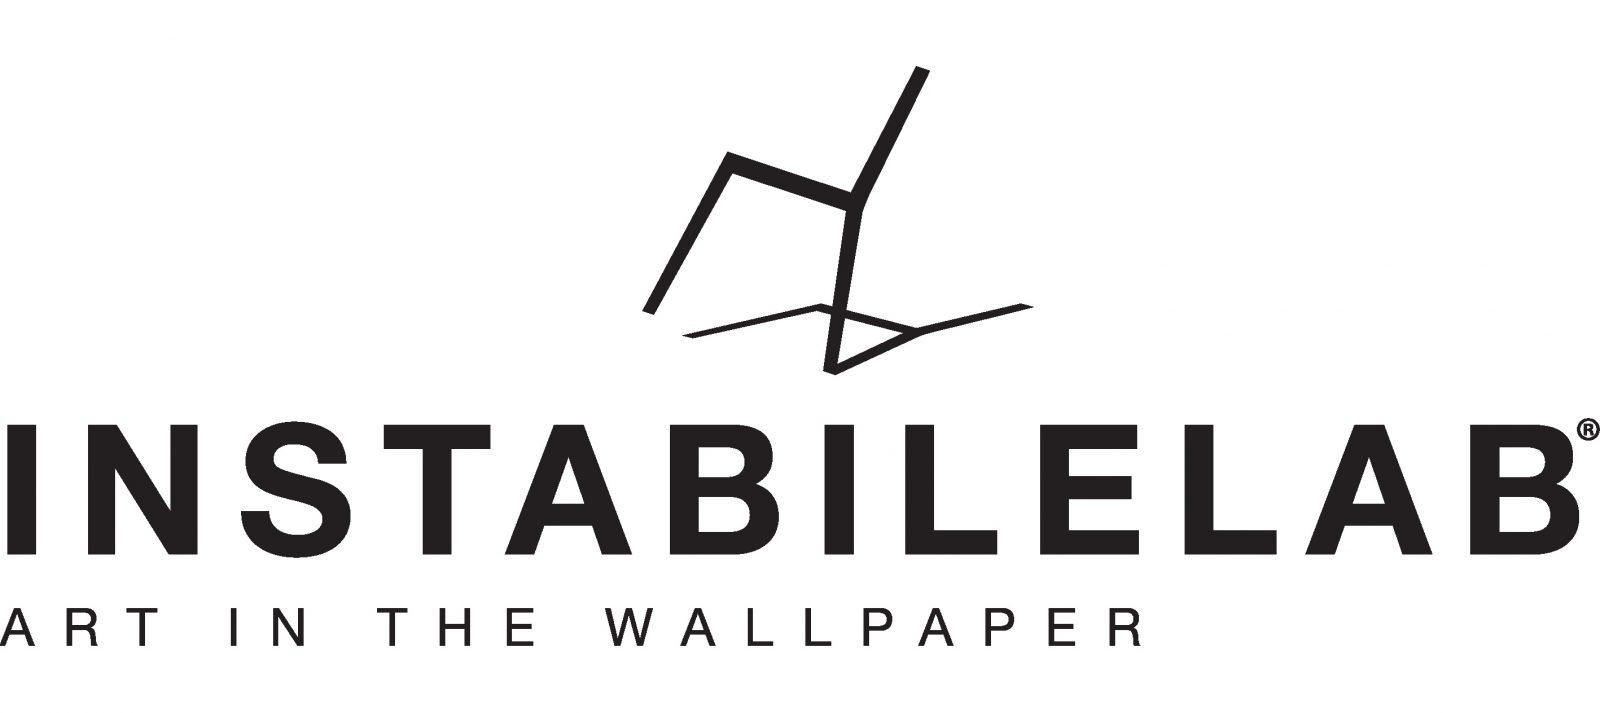 Instabilelab - 1